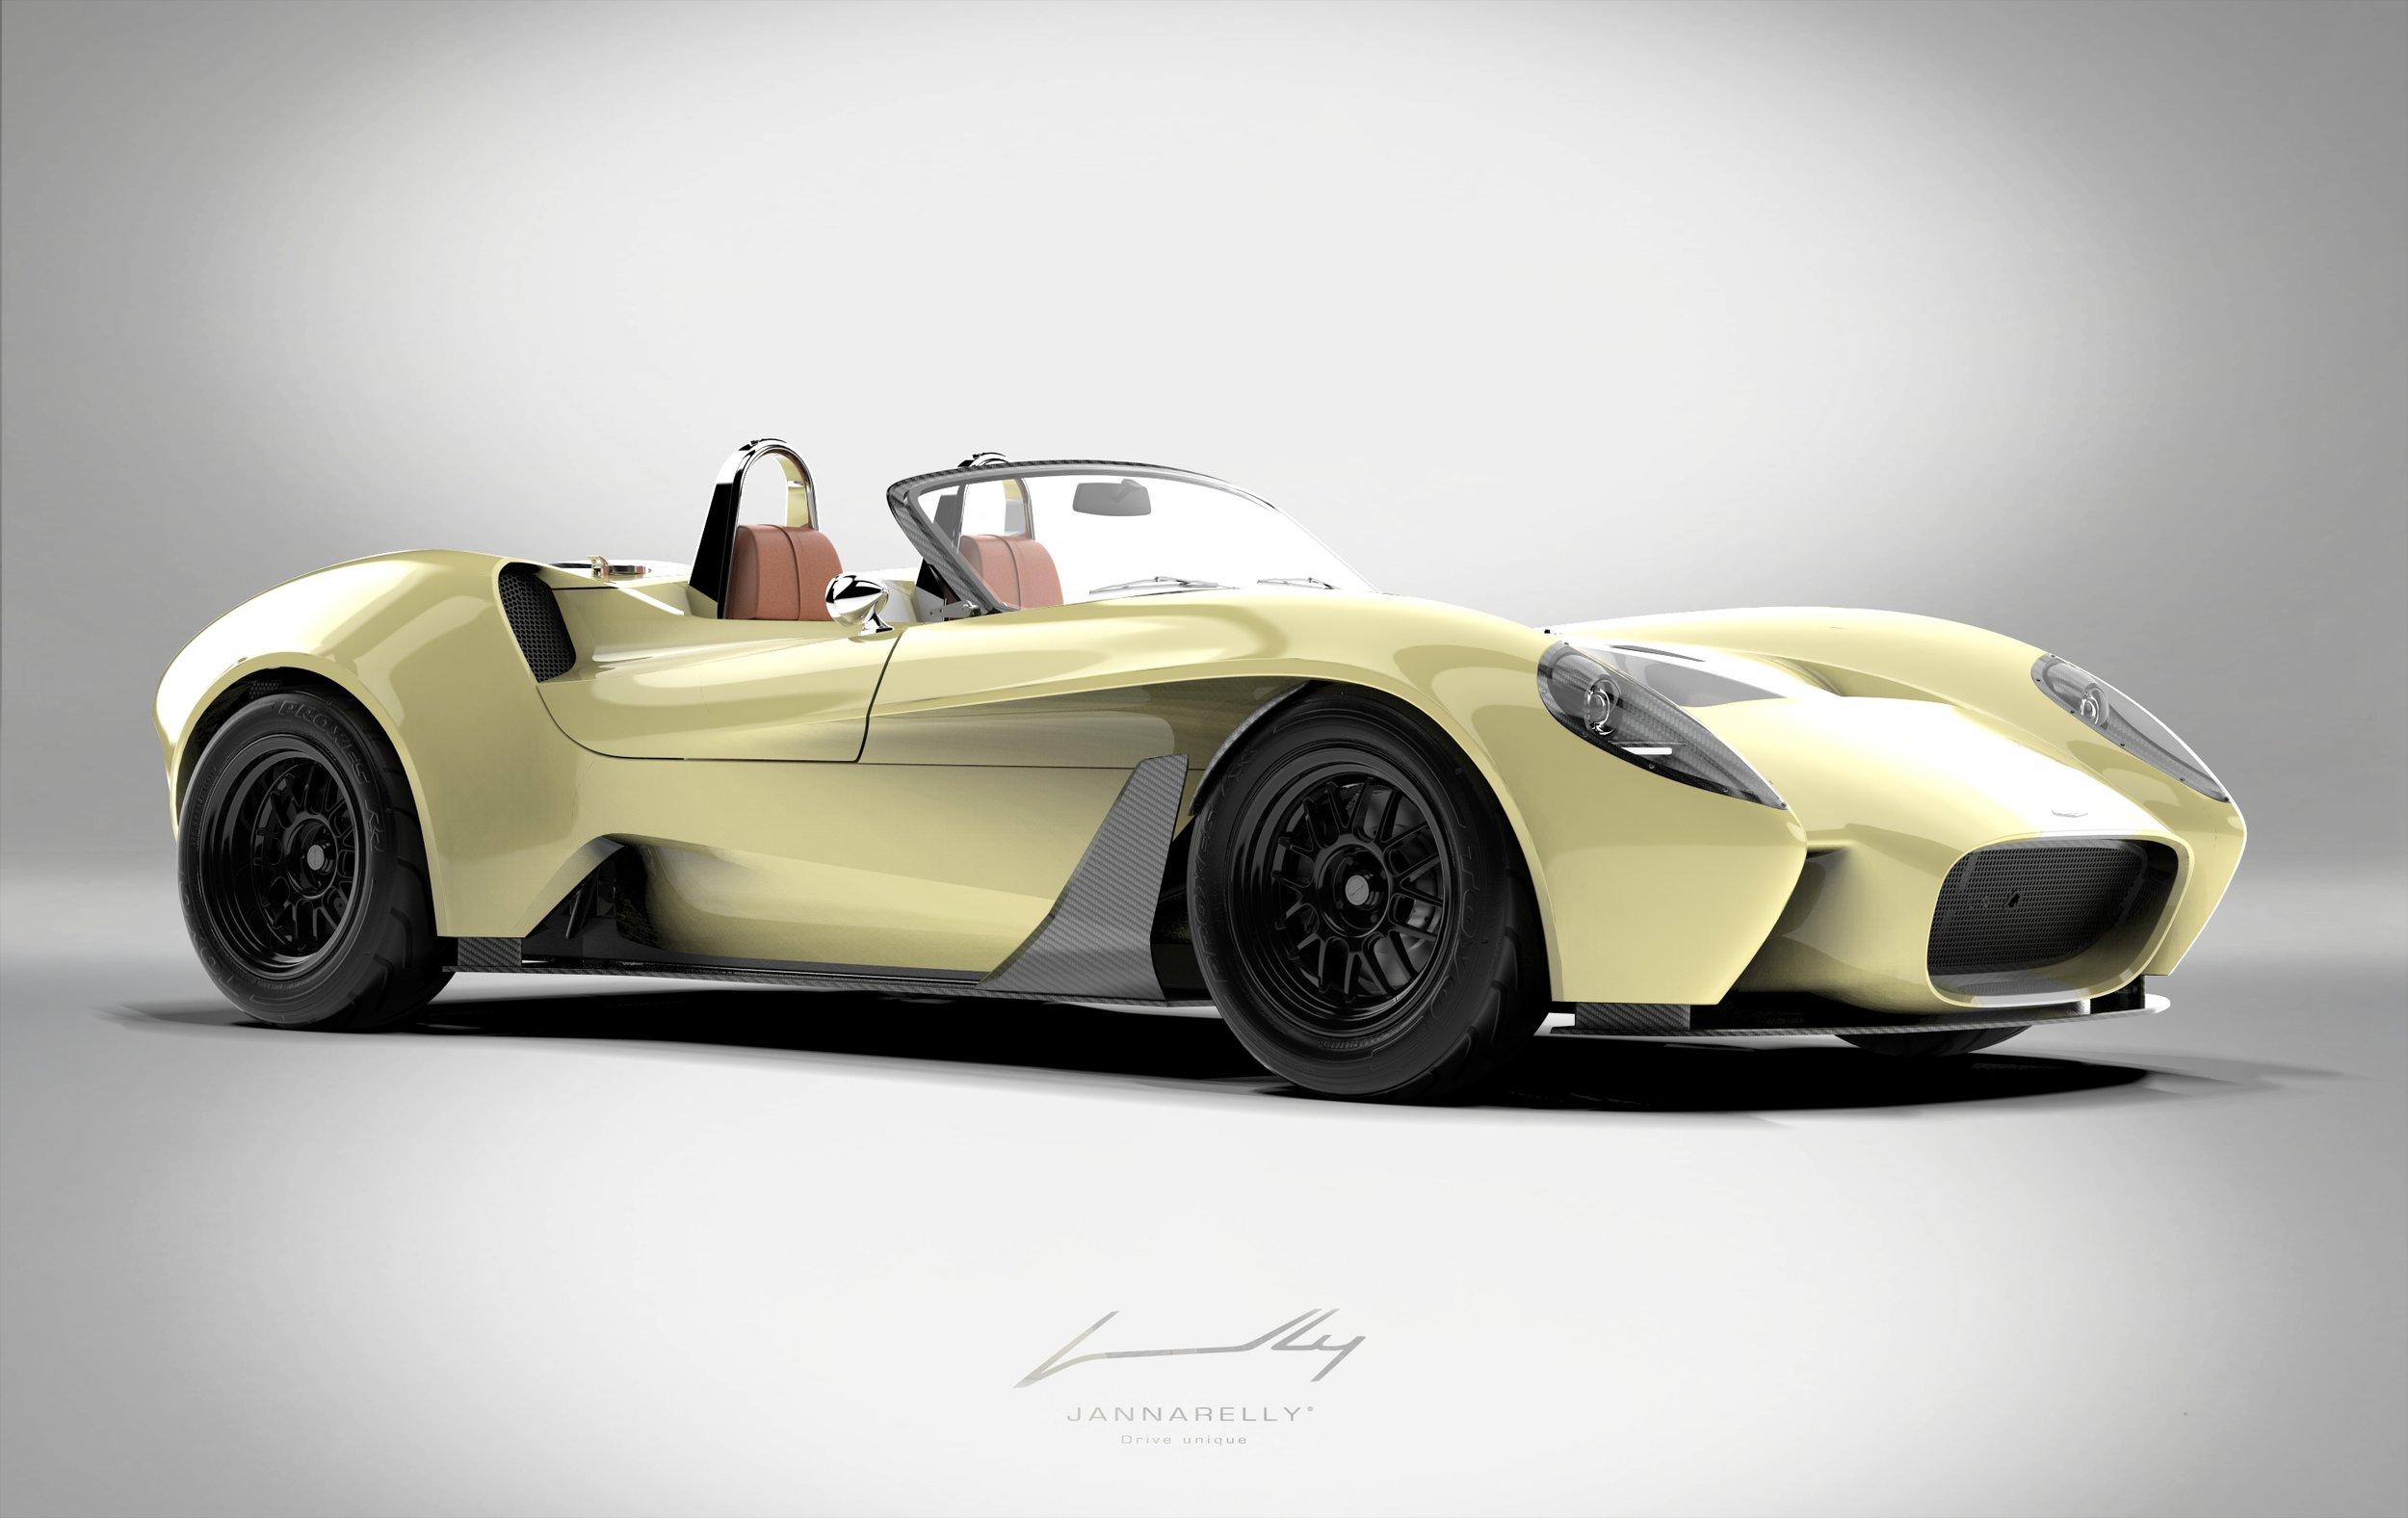 J design1 roadster.316.jpg